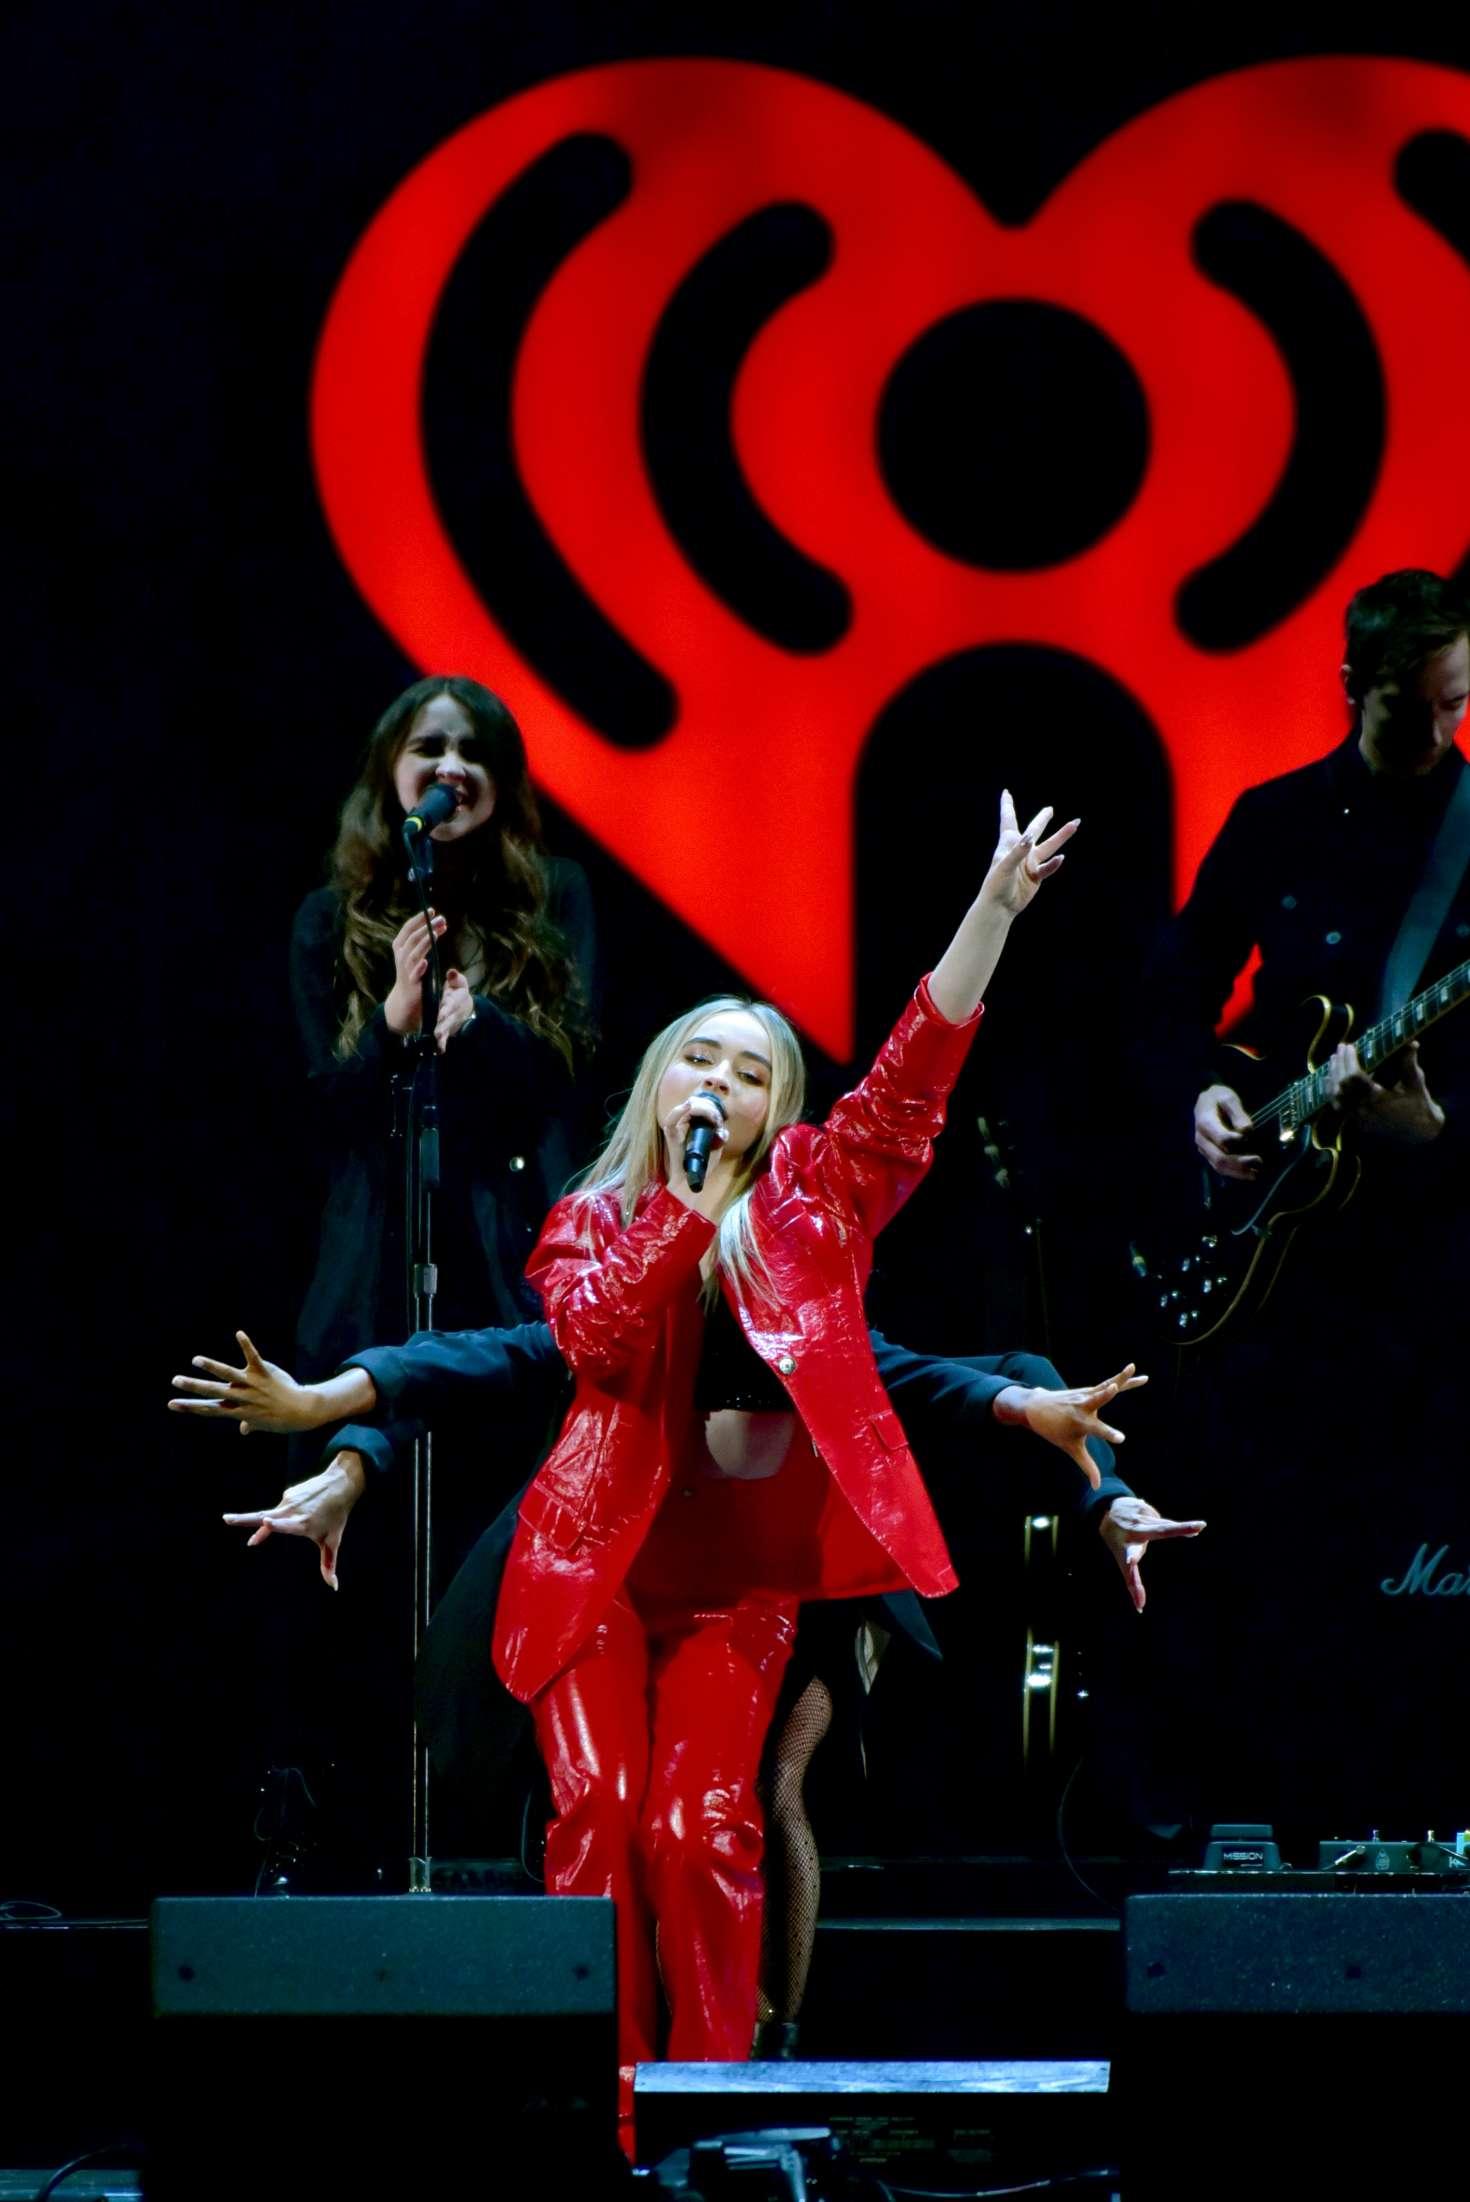 Sabrina Carpenter 2018 : Sabrina Carpenter: iHeart Radio Jingle Ball Performance -02